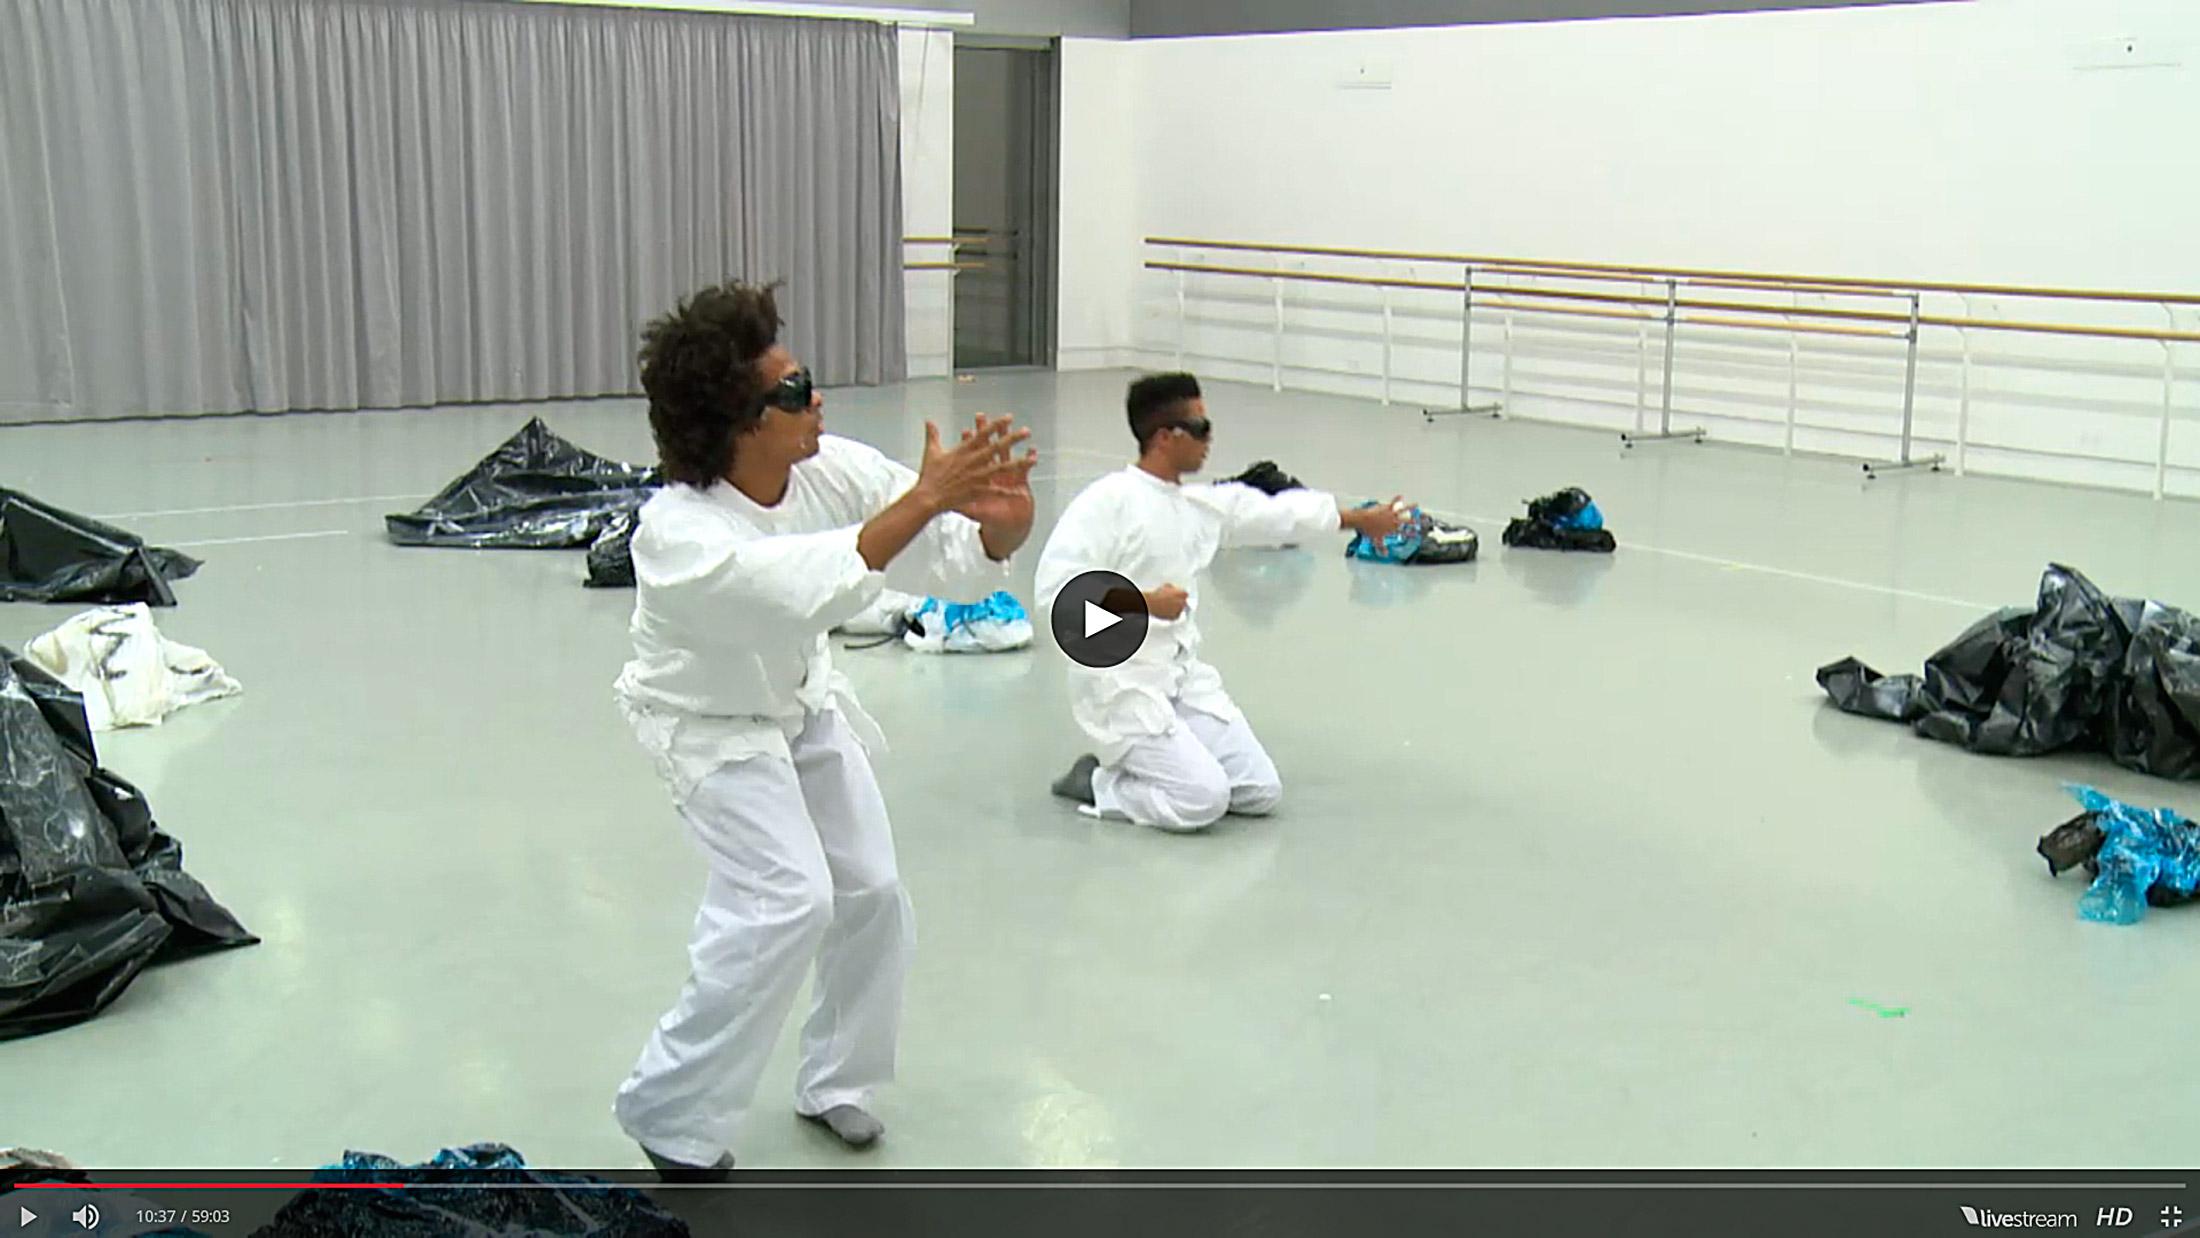 Michaela Zimmer & Miguel Altunaga: Labo(rat)ori